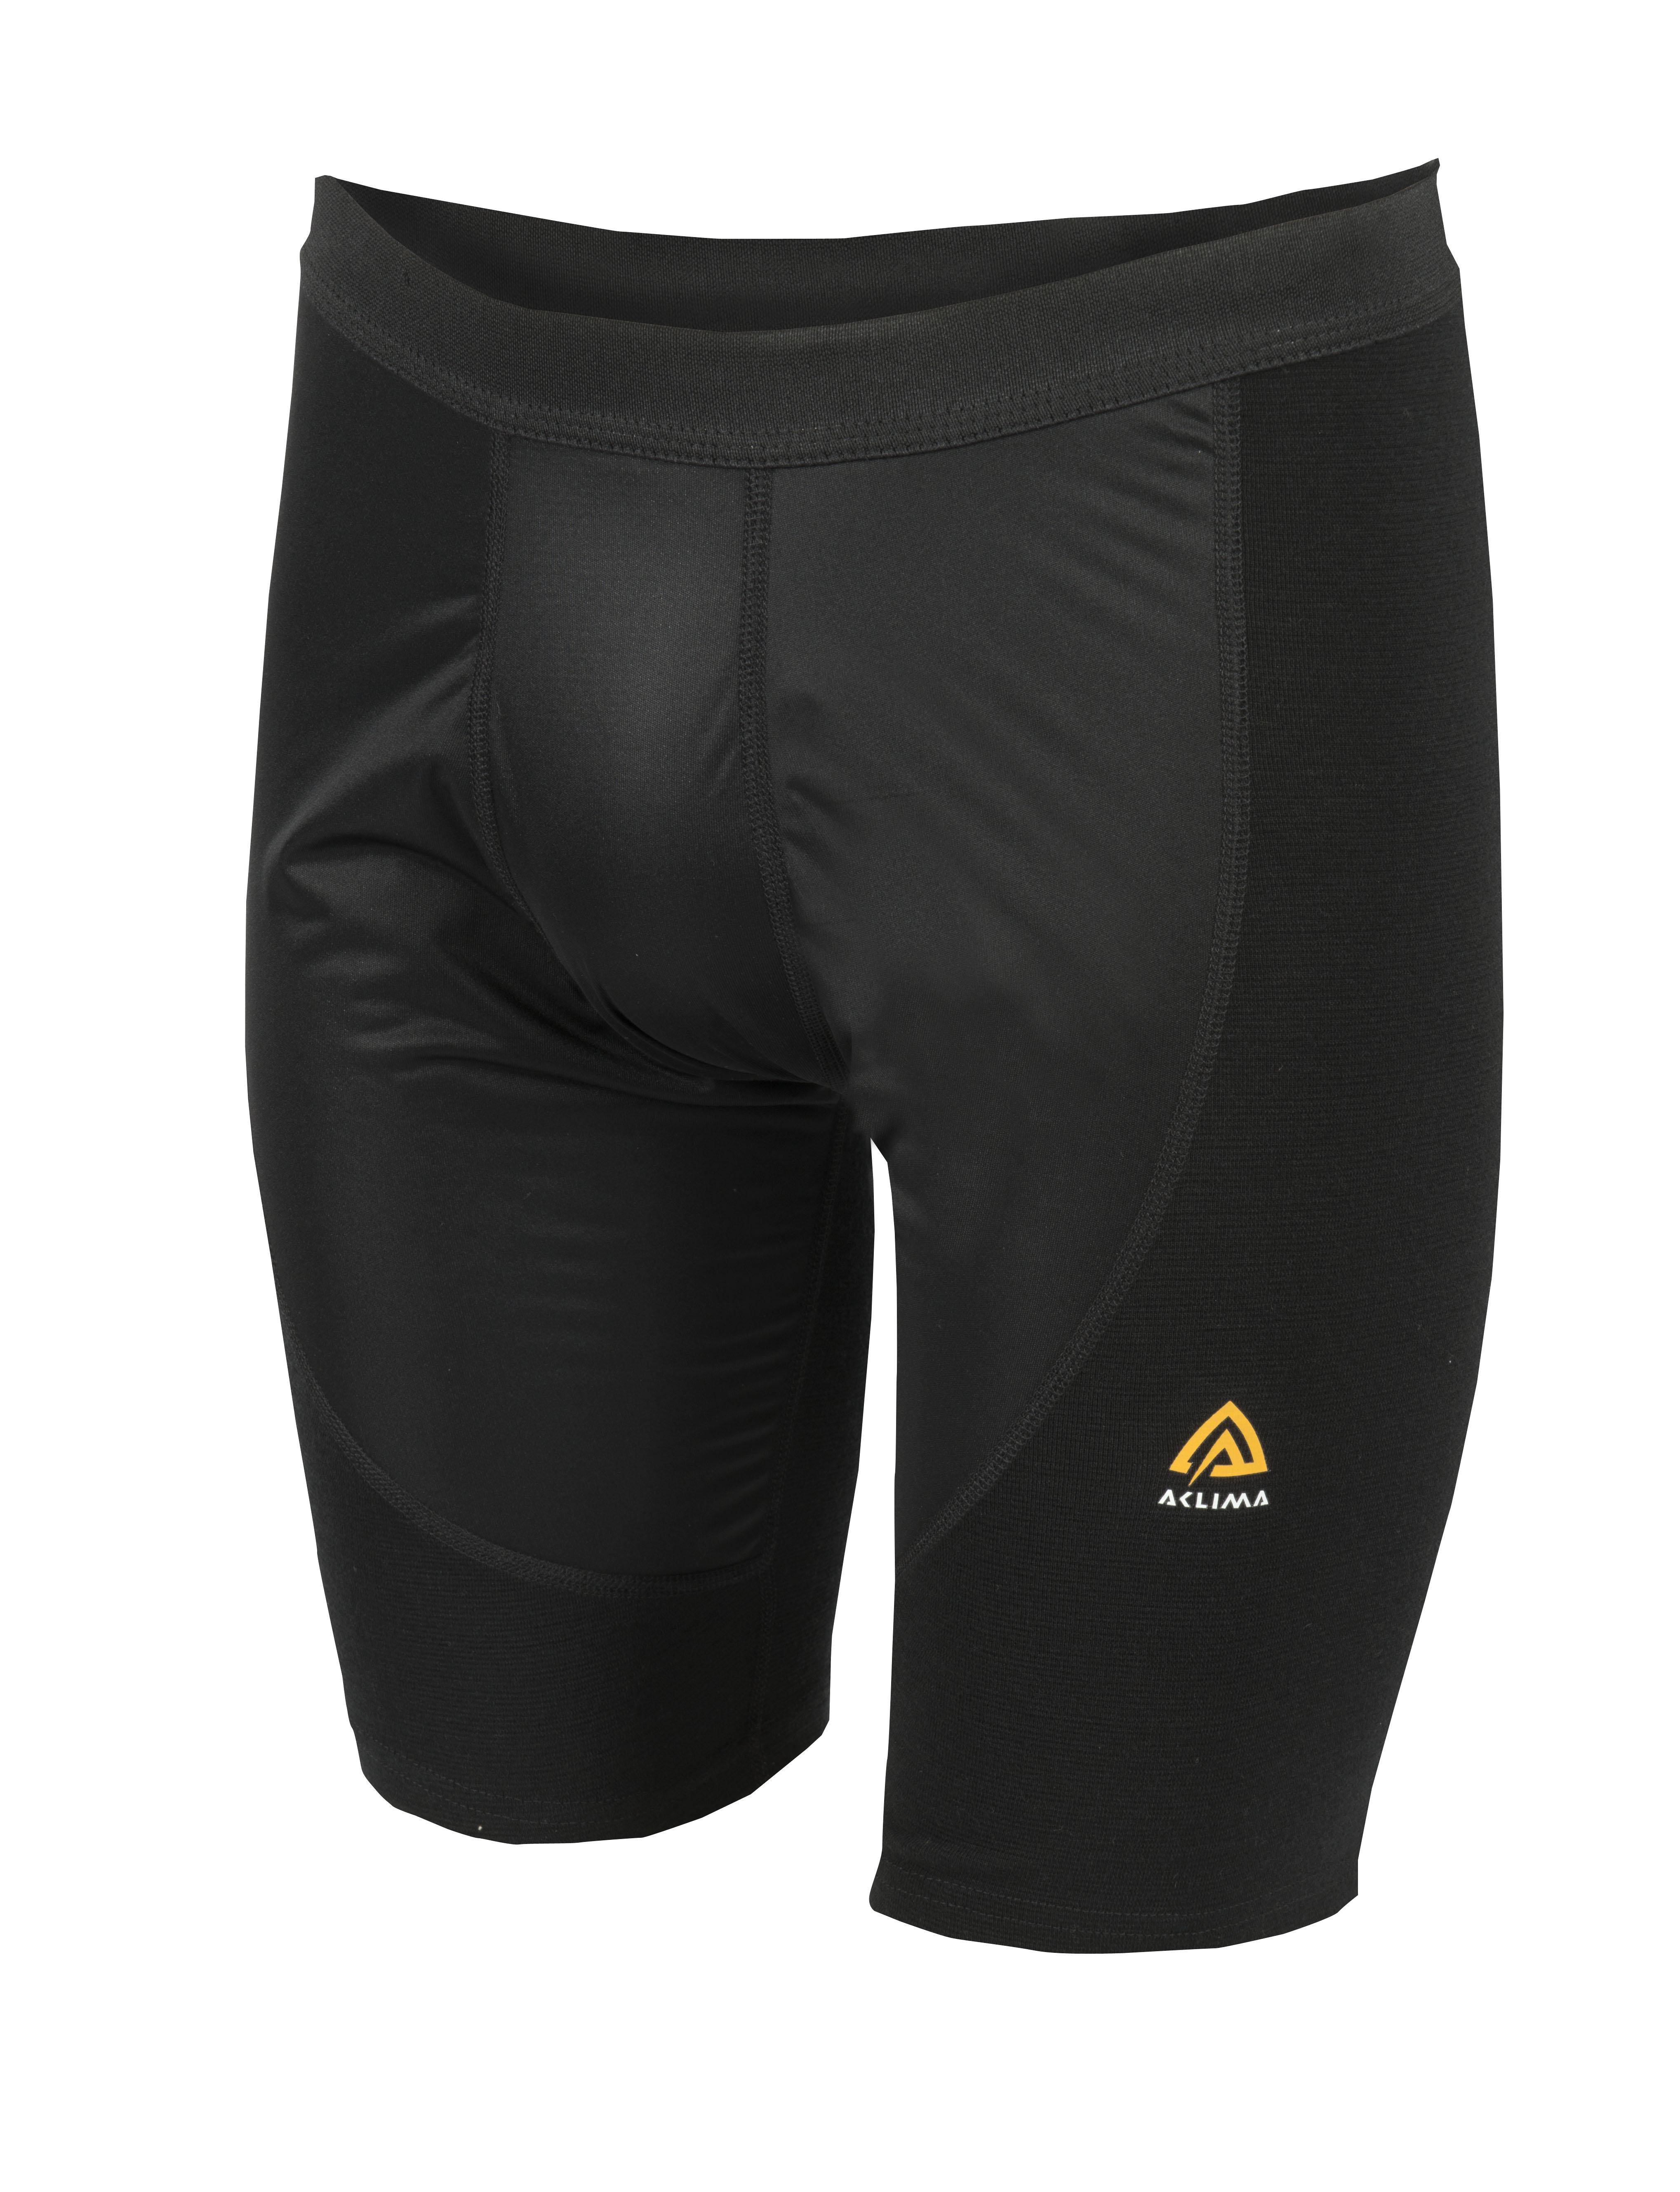 Warmwool Windstopper Boxer Shorts Man